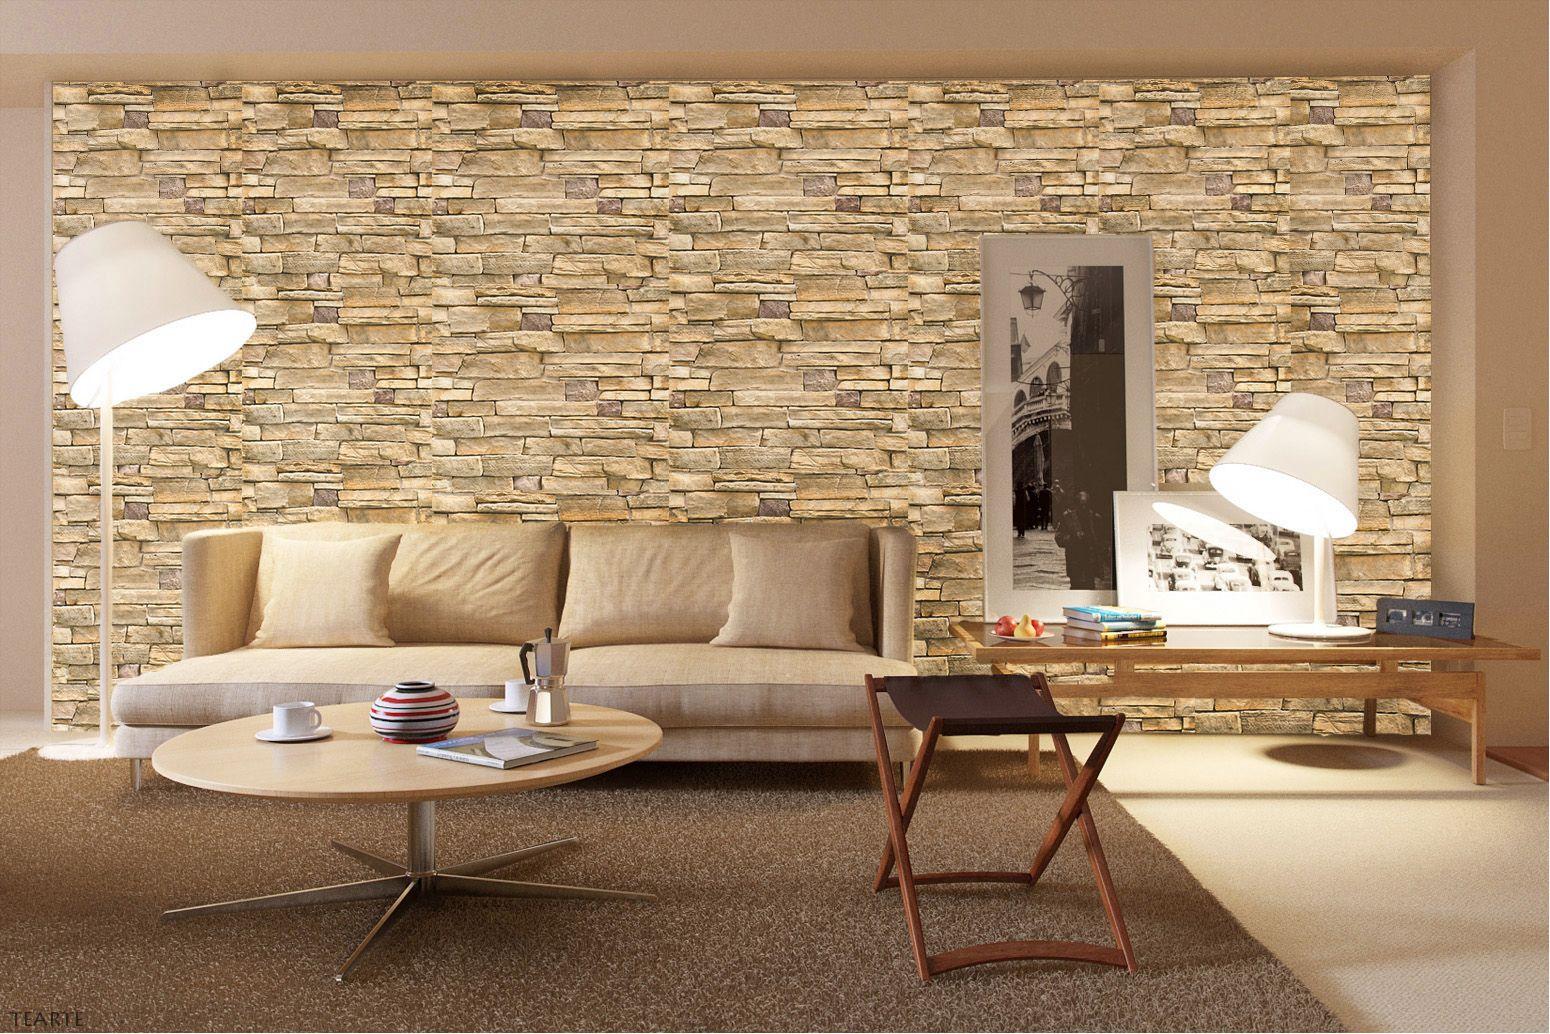 Living con papel mural de piedras beige ideas para tus for Murales de pared